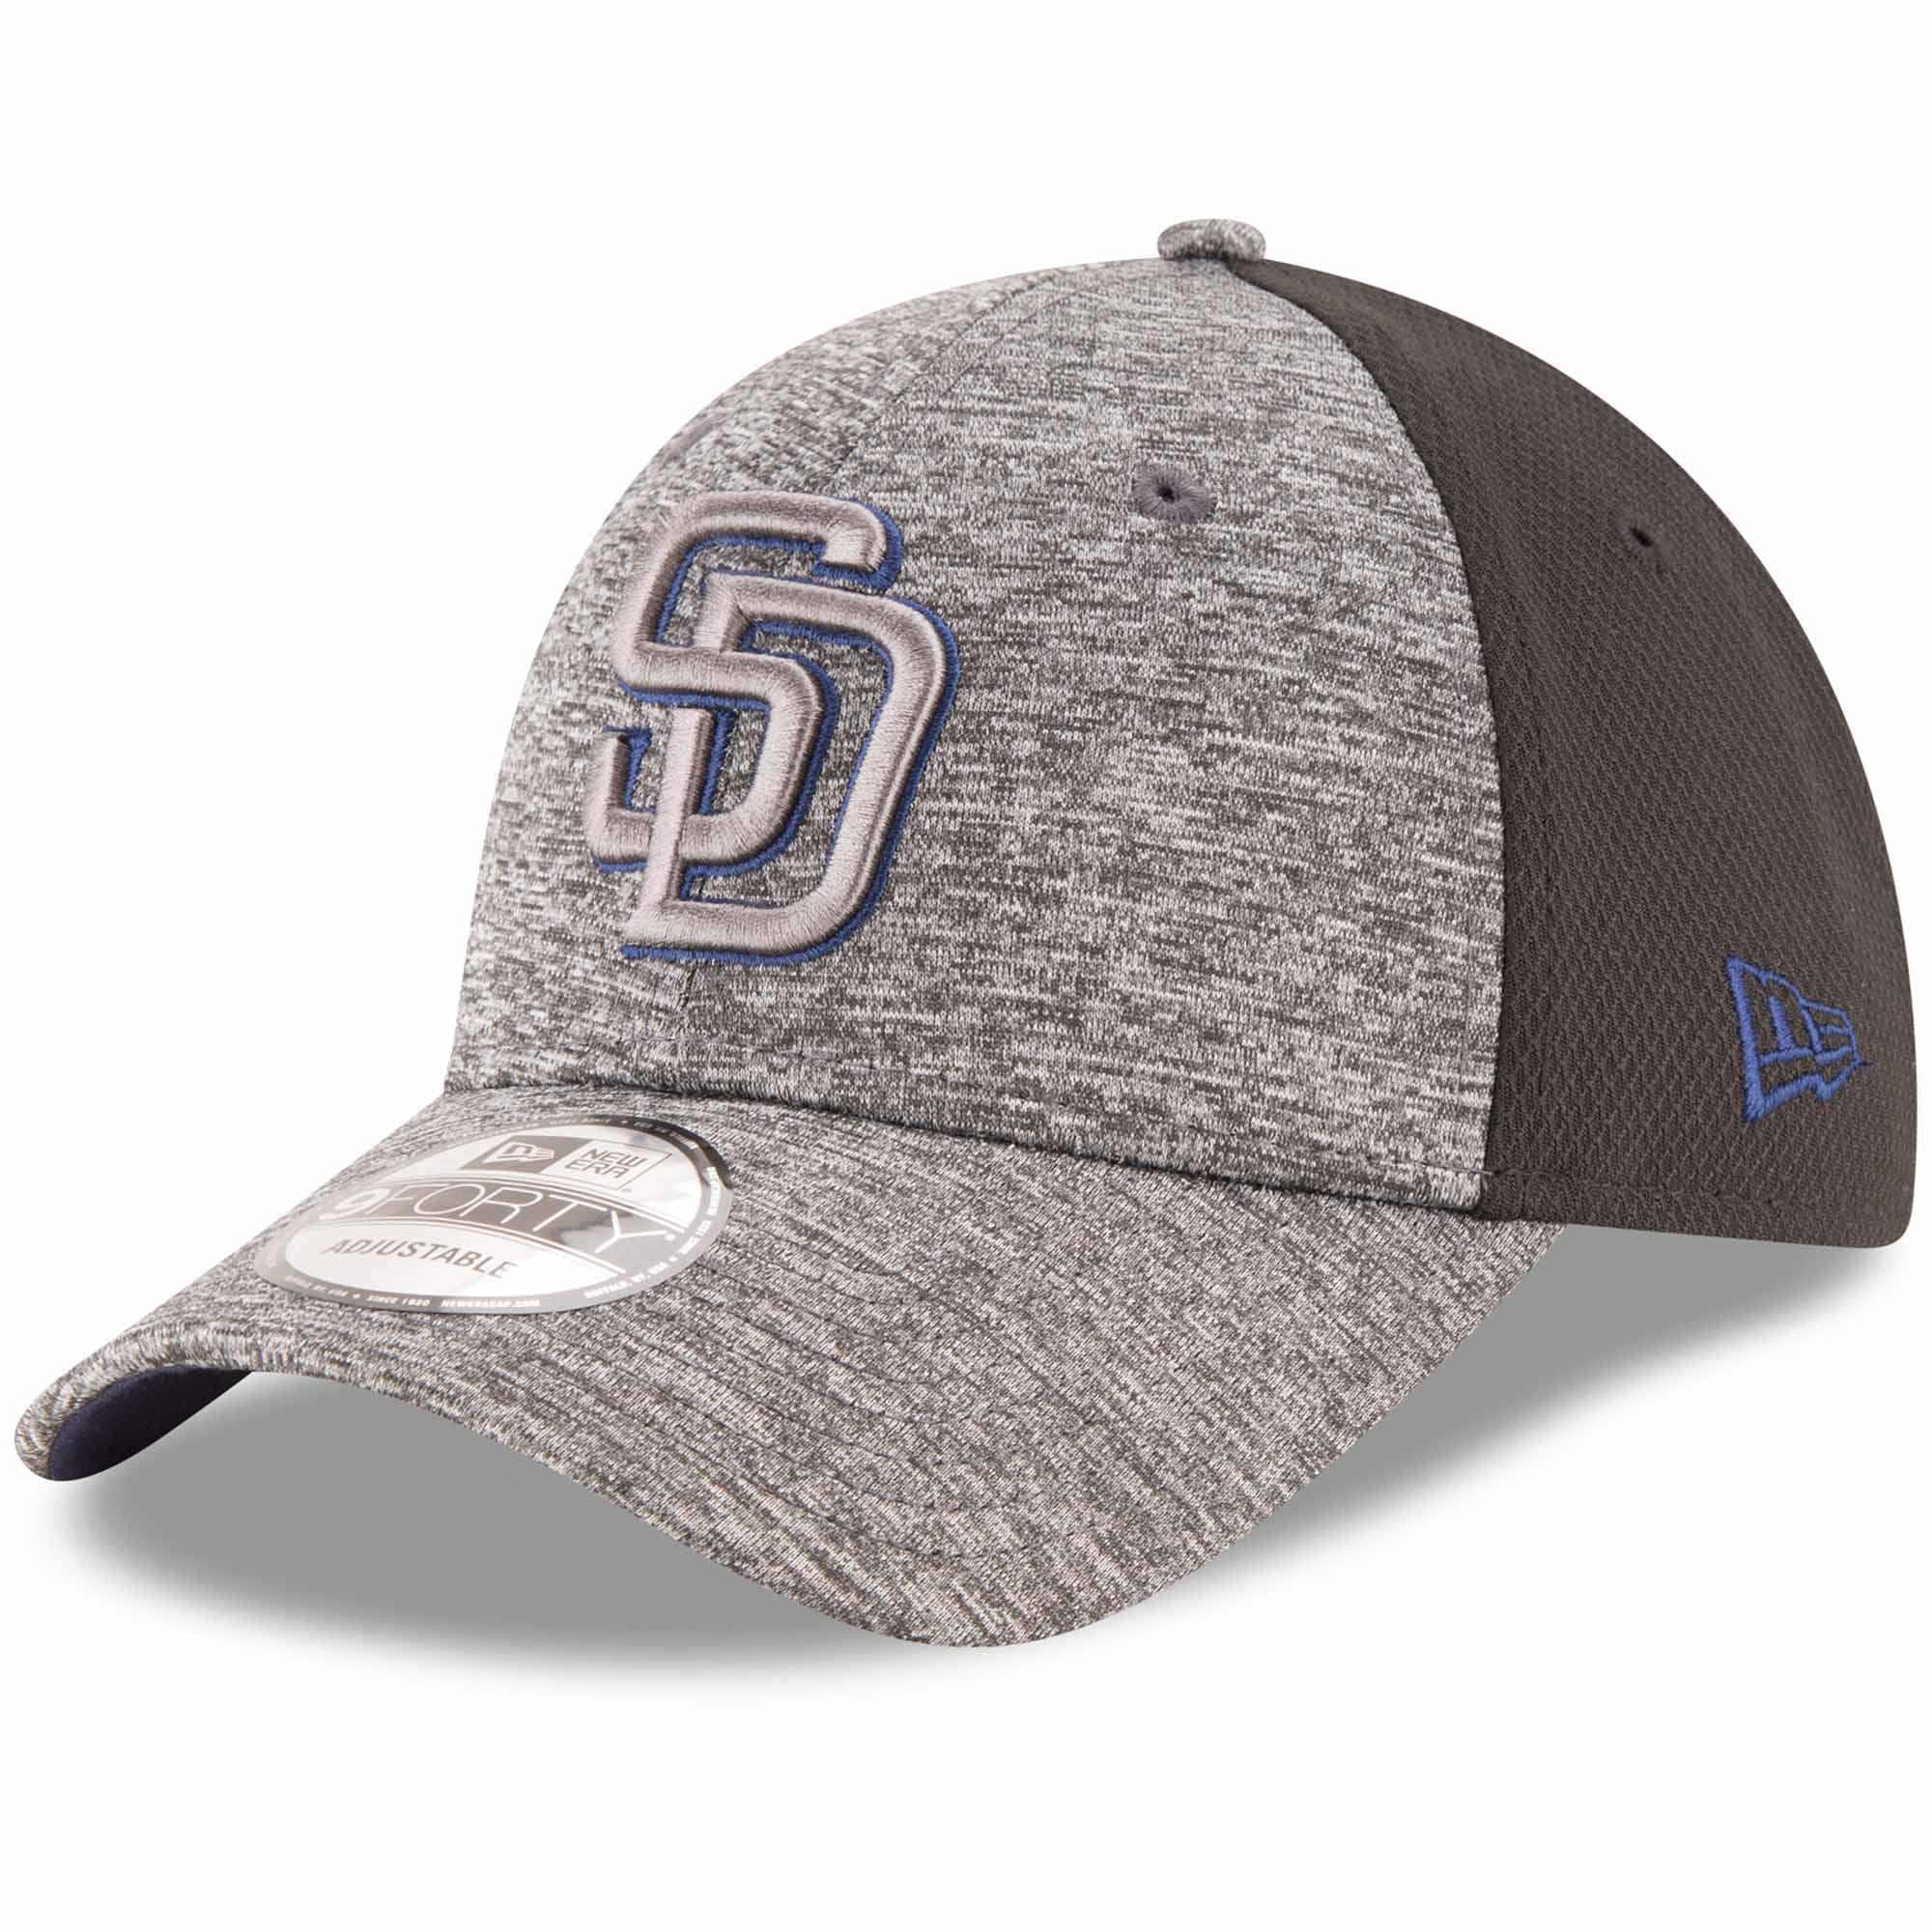 San Diego Padres New Era Shadowed Team Logo 9FORTY Adjustable Hat - Heathered Gray/Black - OSFA